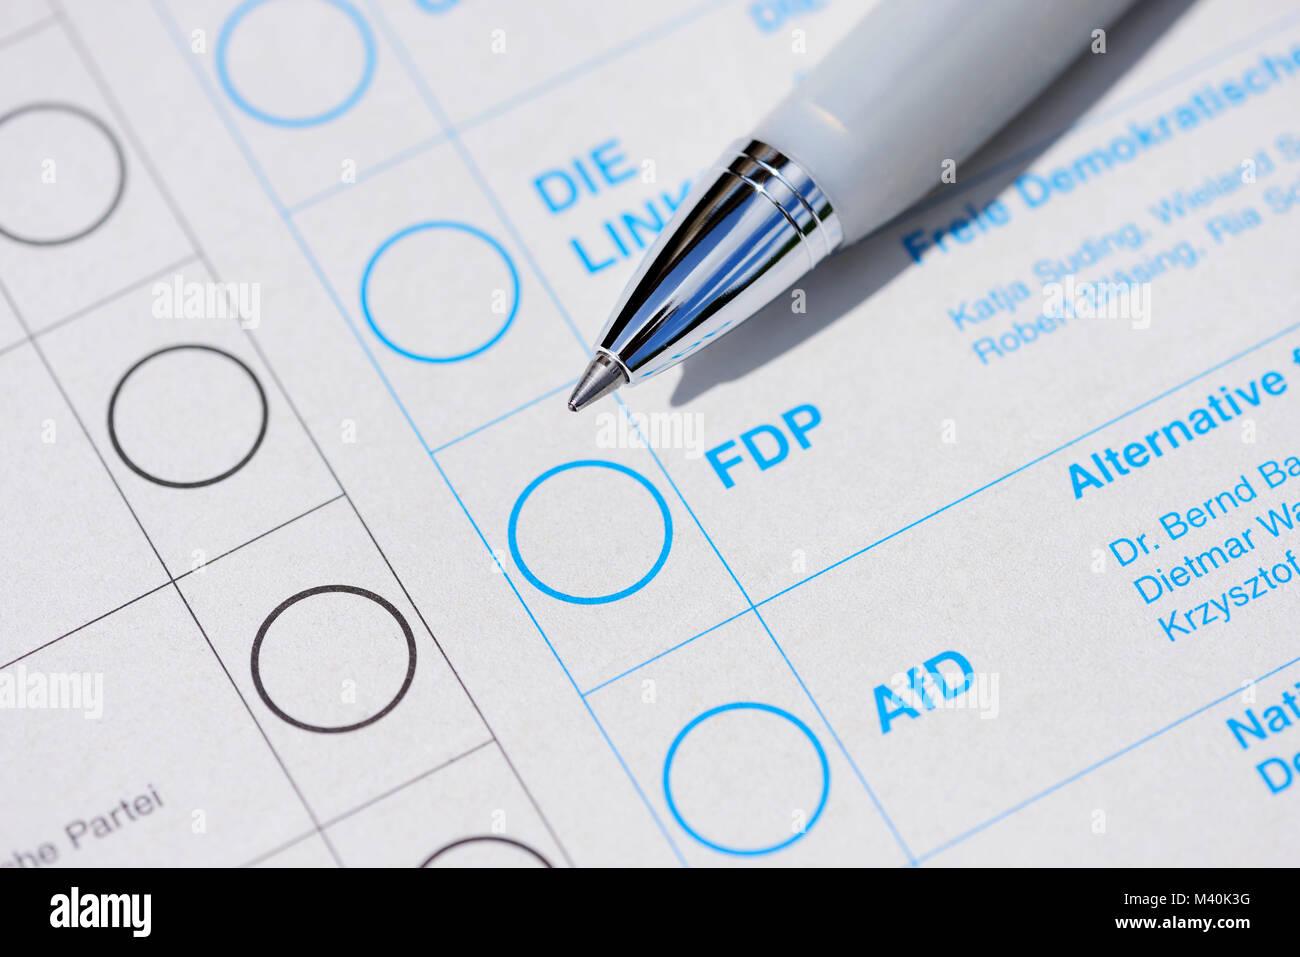 Ballot in the federal elections., Stimmzettel zur Bundestagswahl - Stock Image